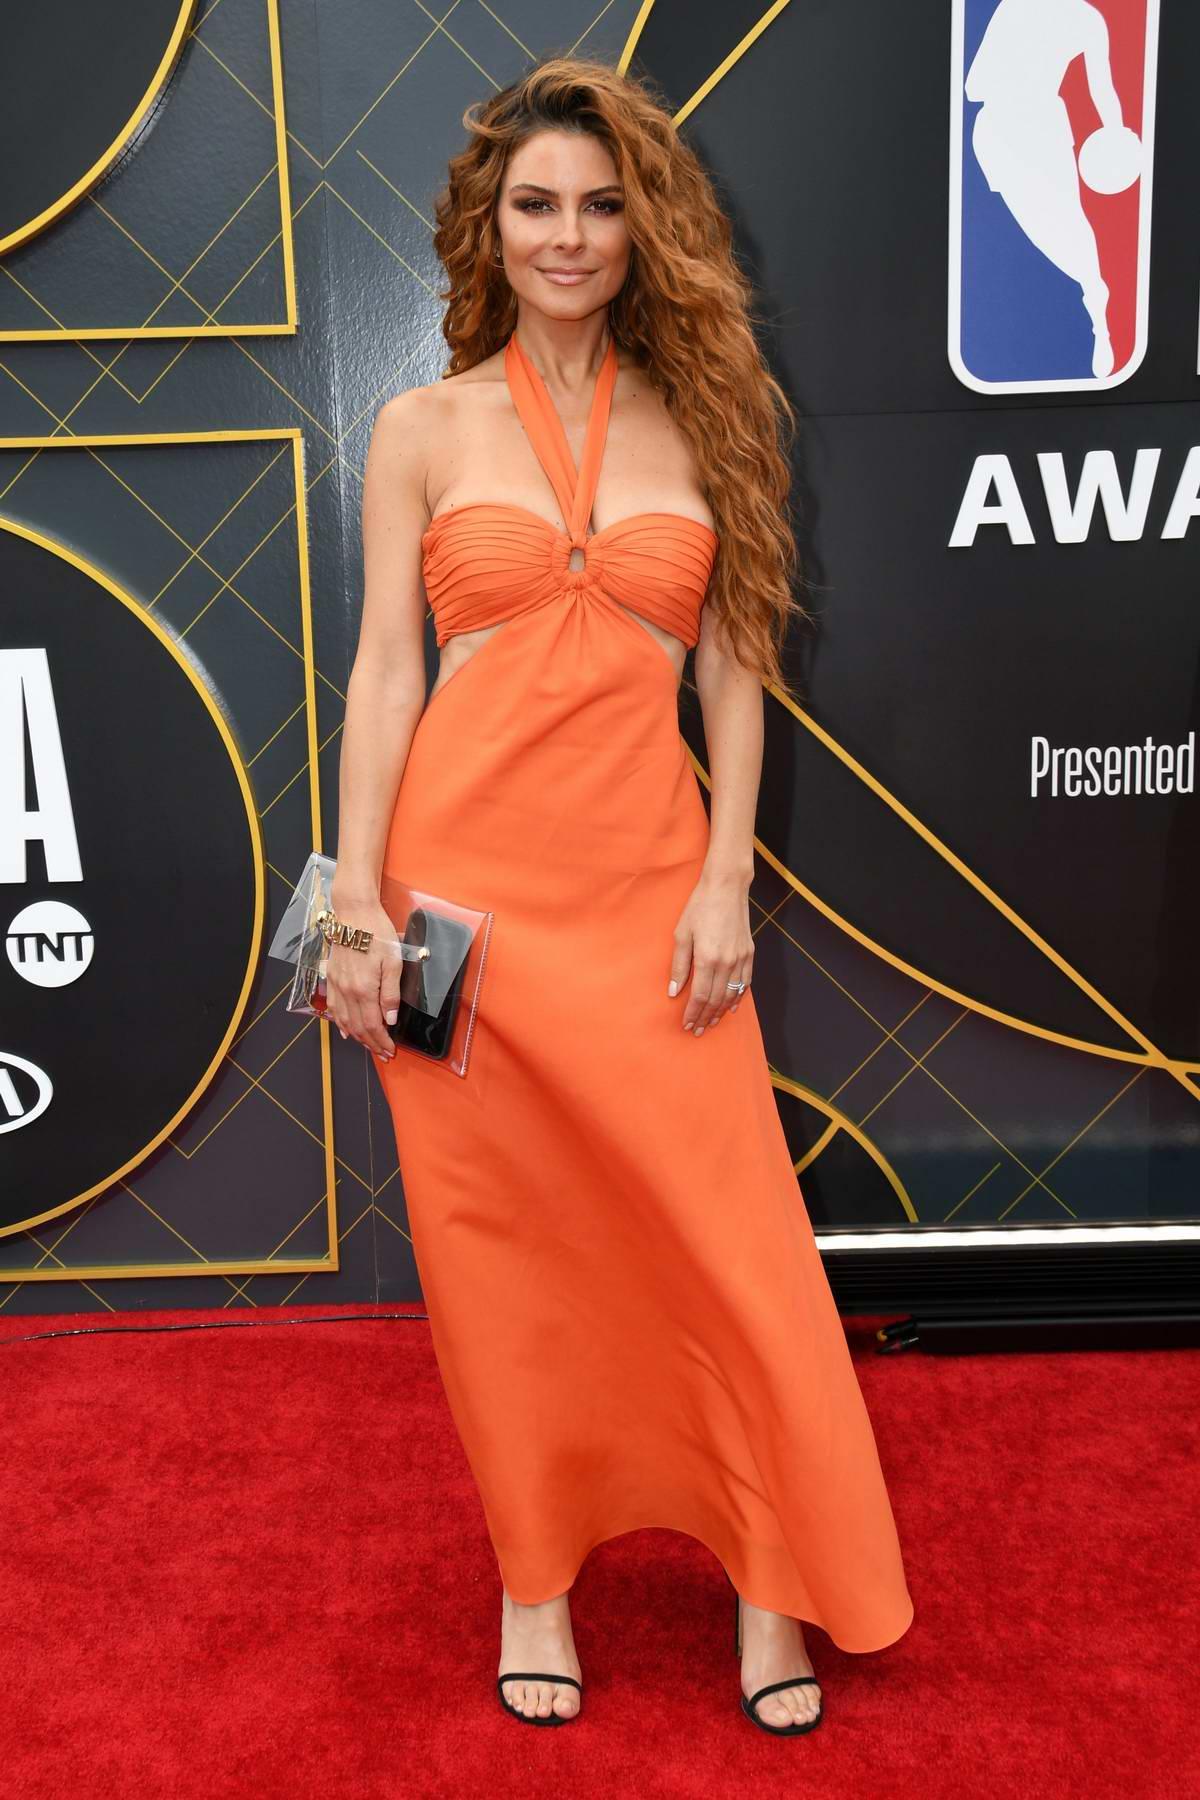 Maria Menounos attends the 2019 NBA Awards held at Barker Hangar in Santa Monica, California